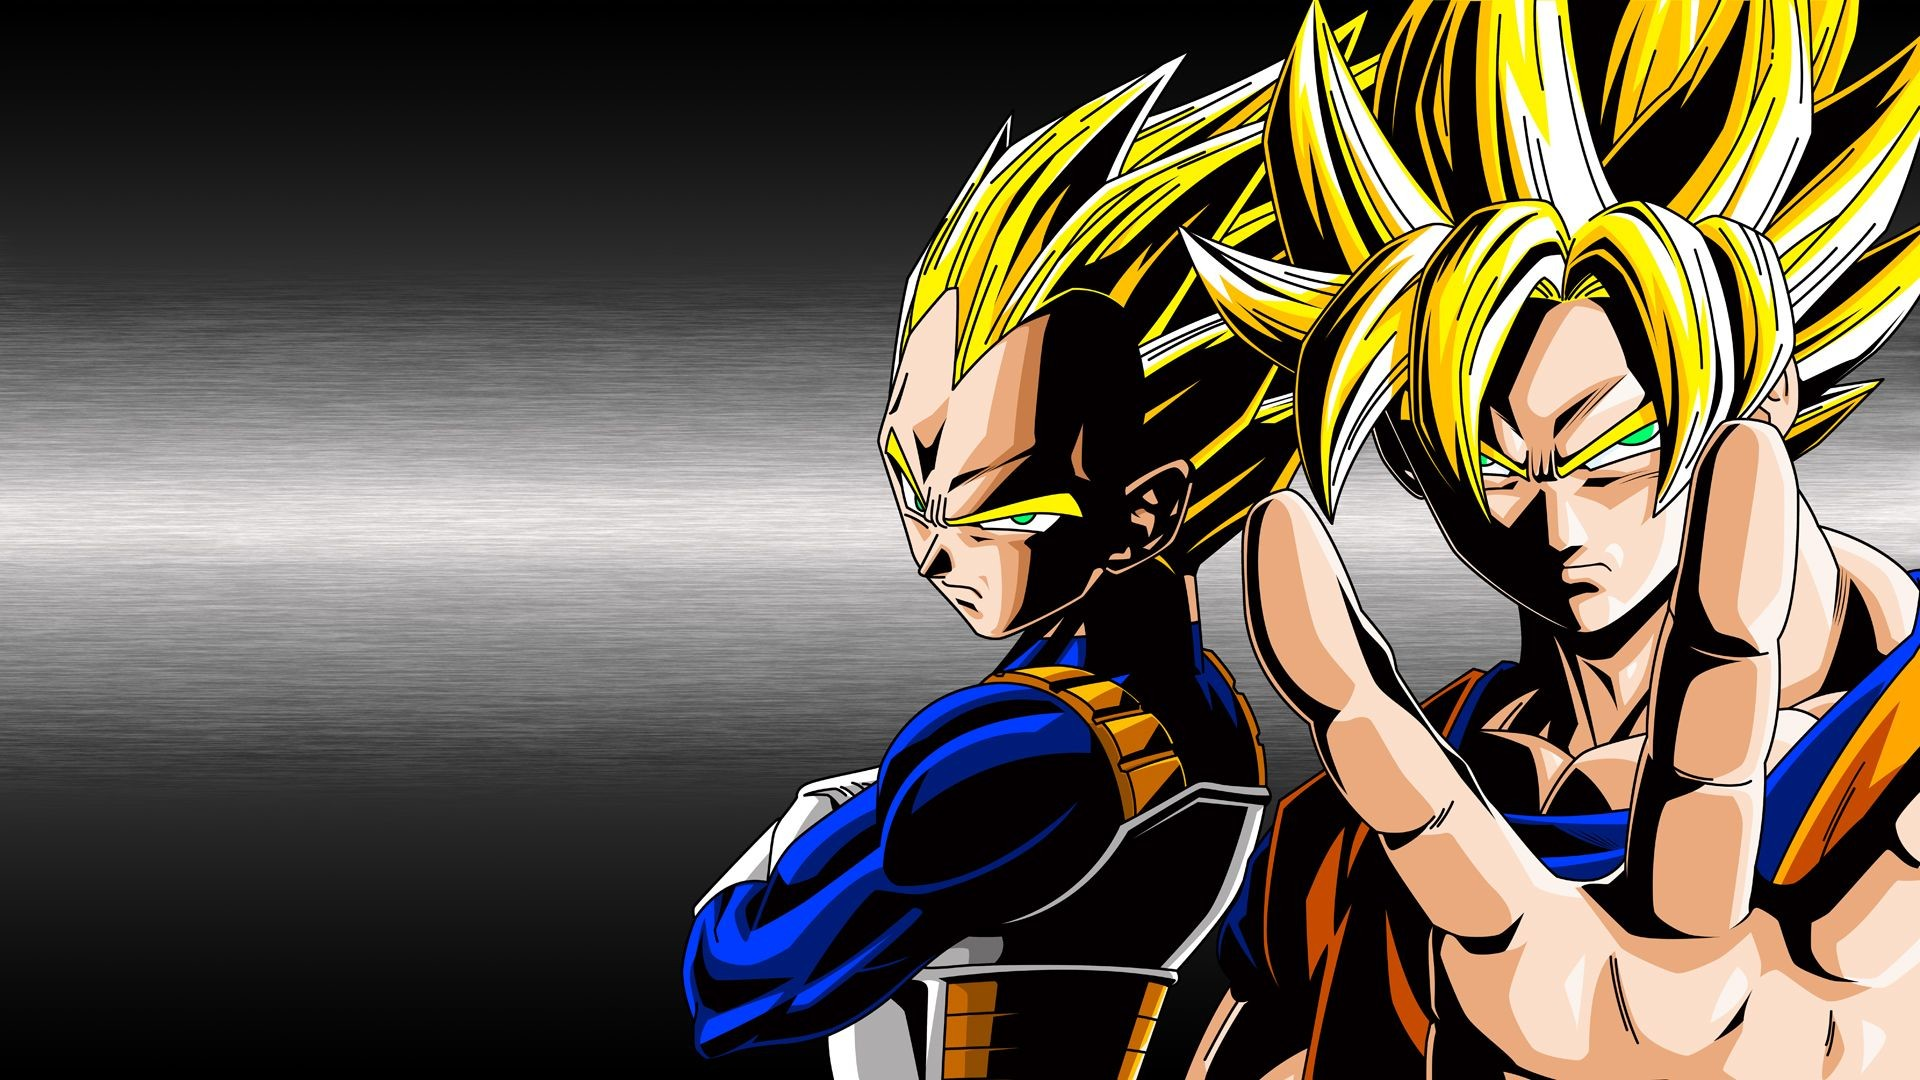 Goku and Vegeta Super Saiyan God Fusion – wallpaper.